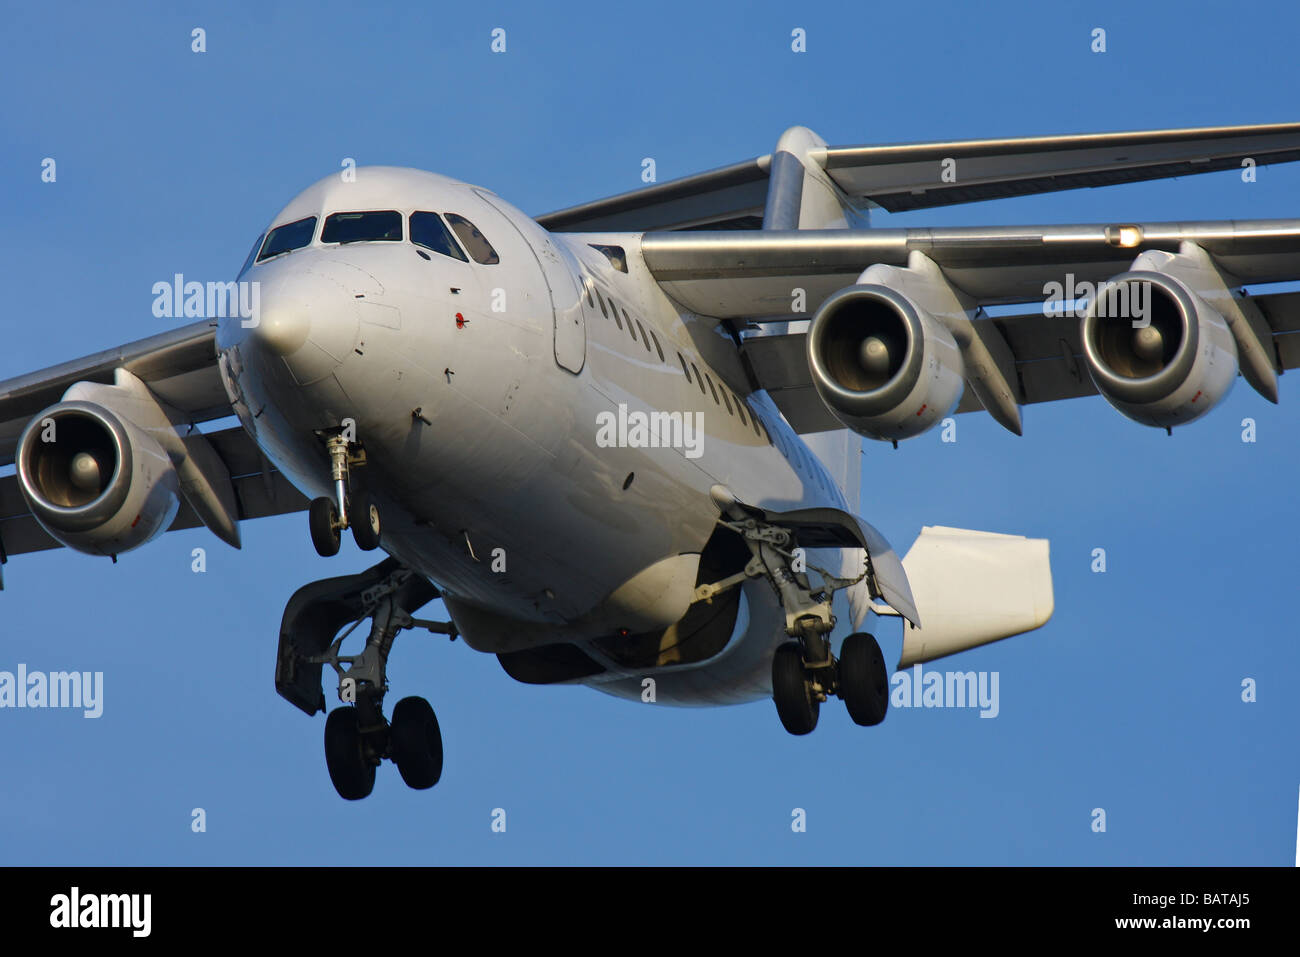 Passanger aircraft landing on London City Airport - Stock Image